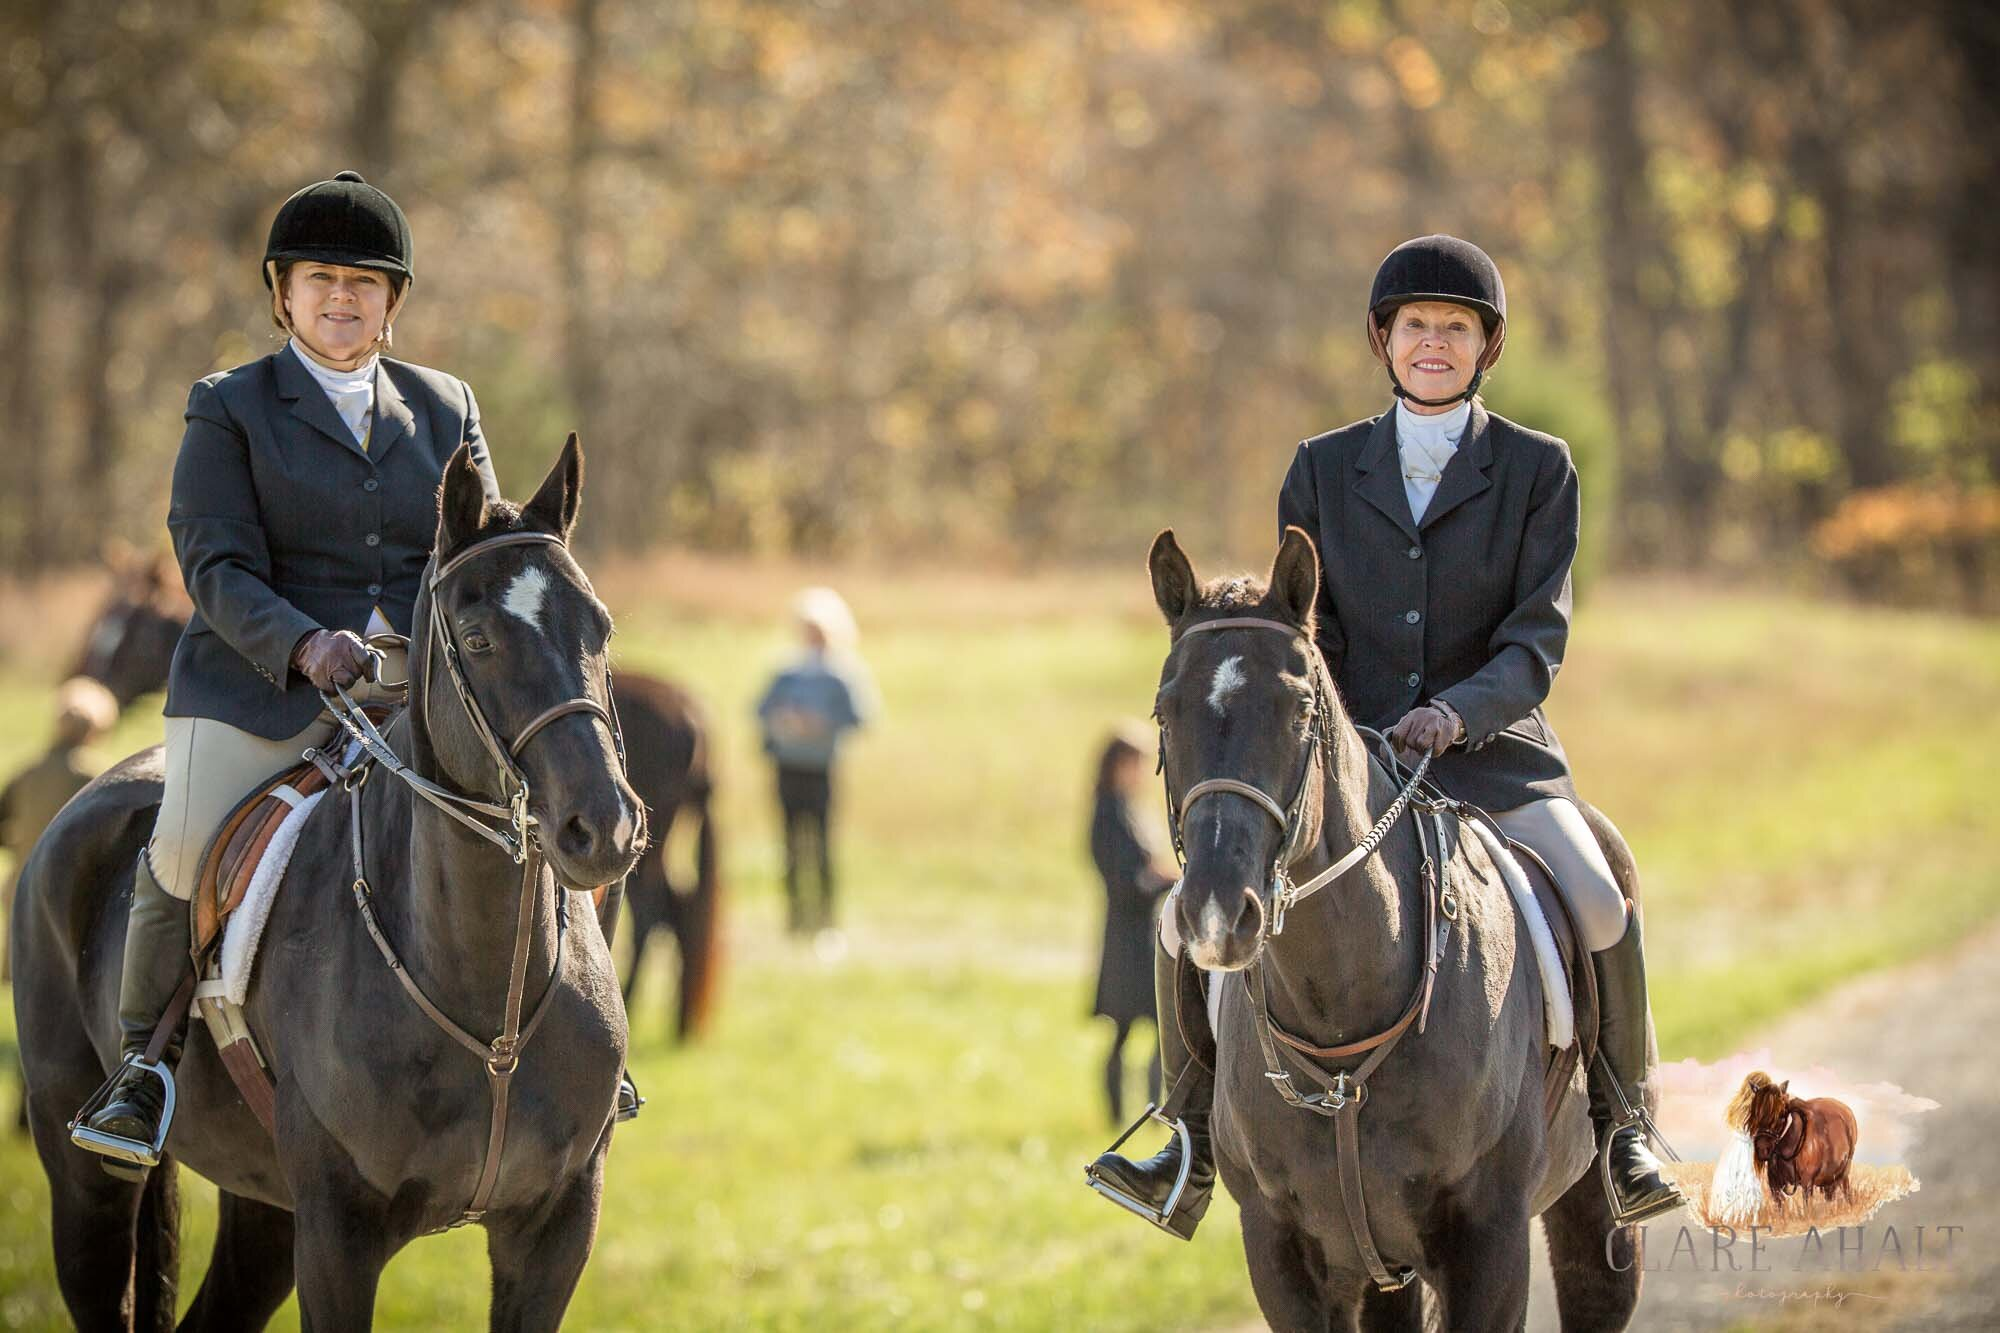 equine_photographer_potomac_md_equine_photographer_middleburg_VA_equine_portraiture_loudon_county_VA-2876.jpg